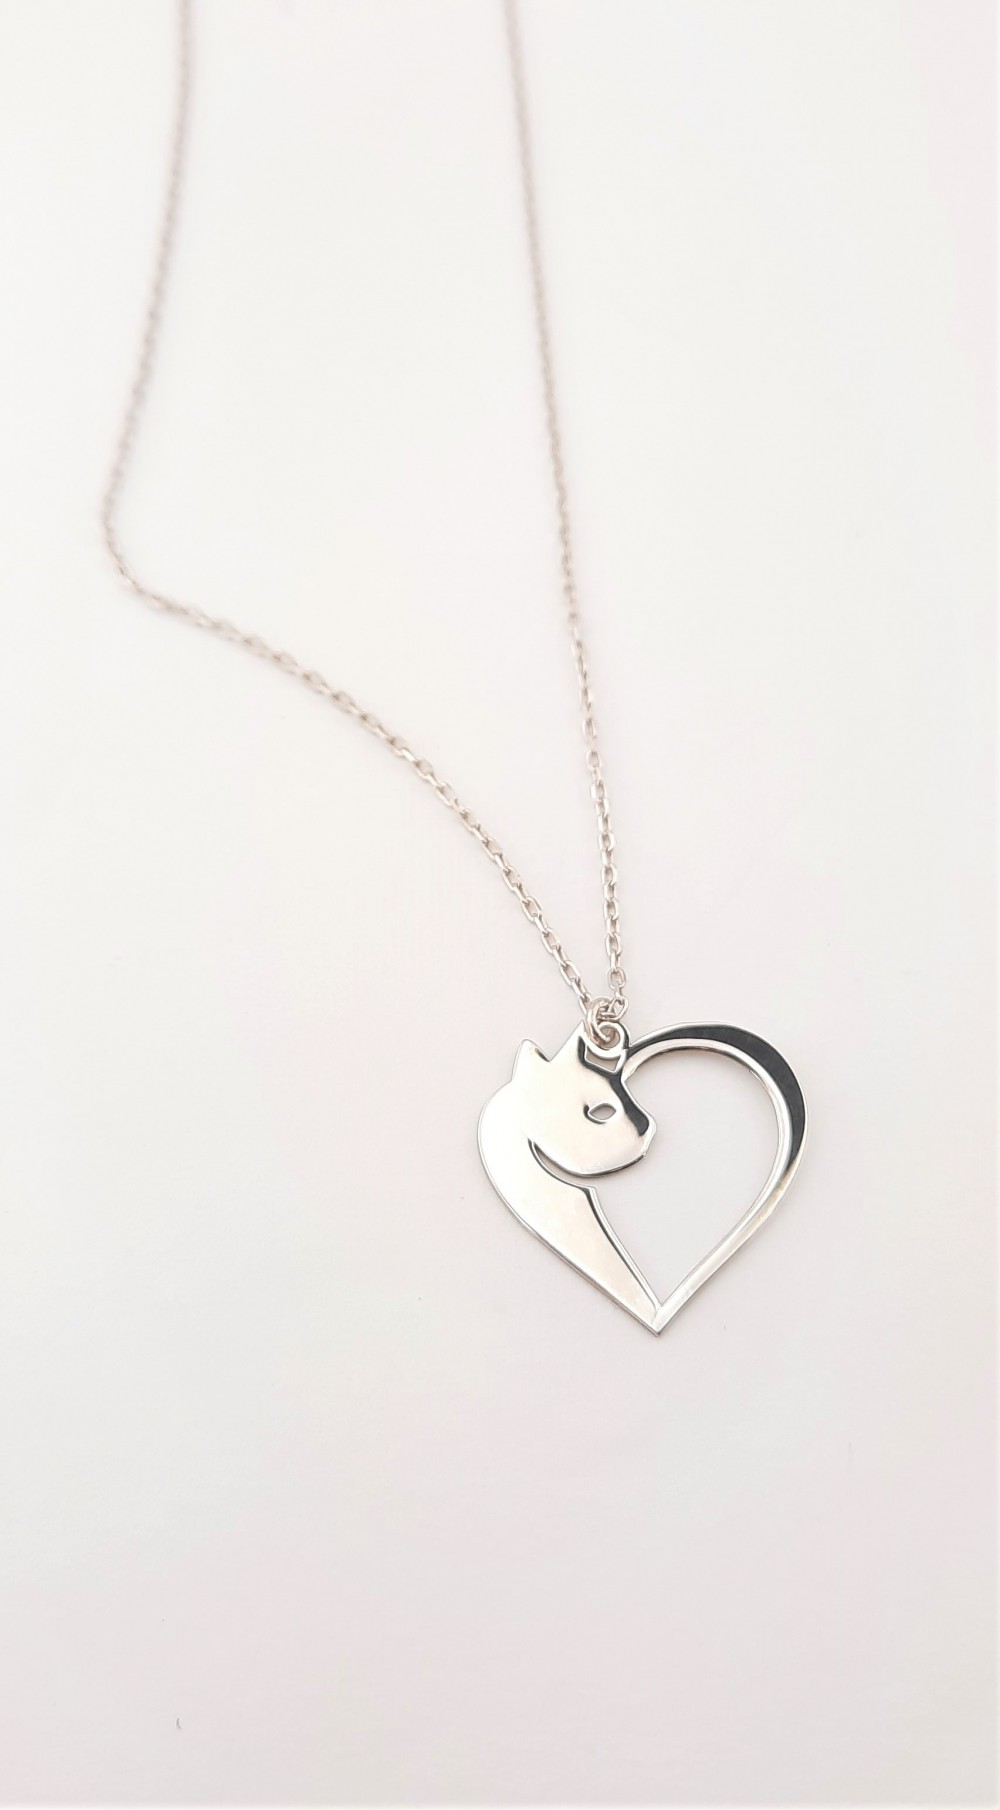 Kalpli Kedi Taşsız Gümüş Kolye